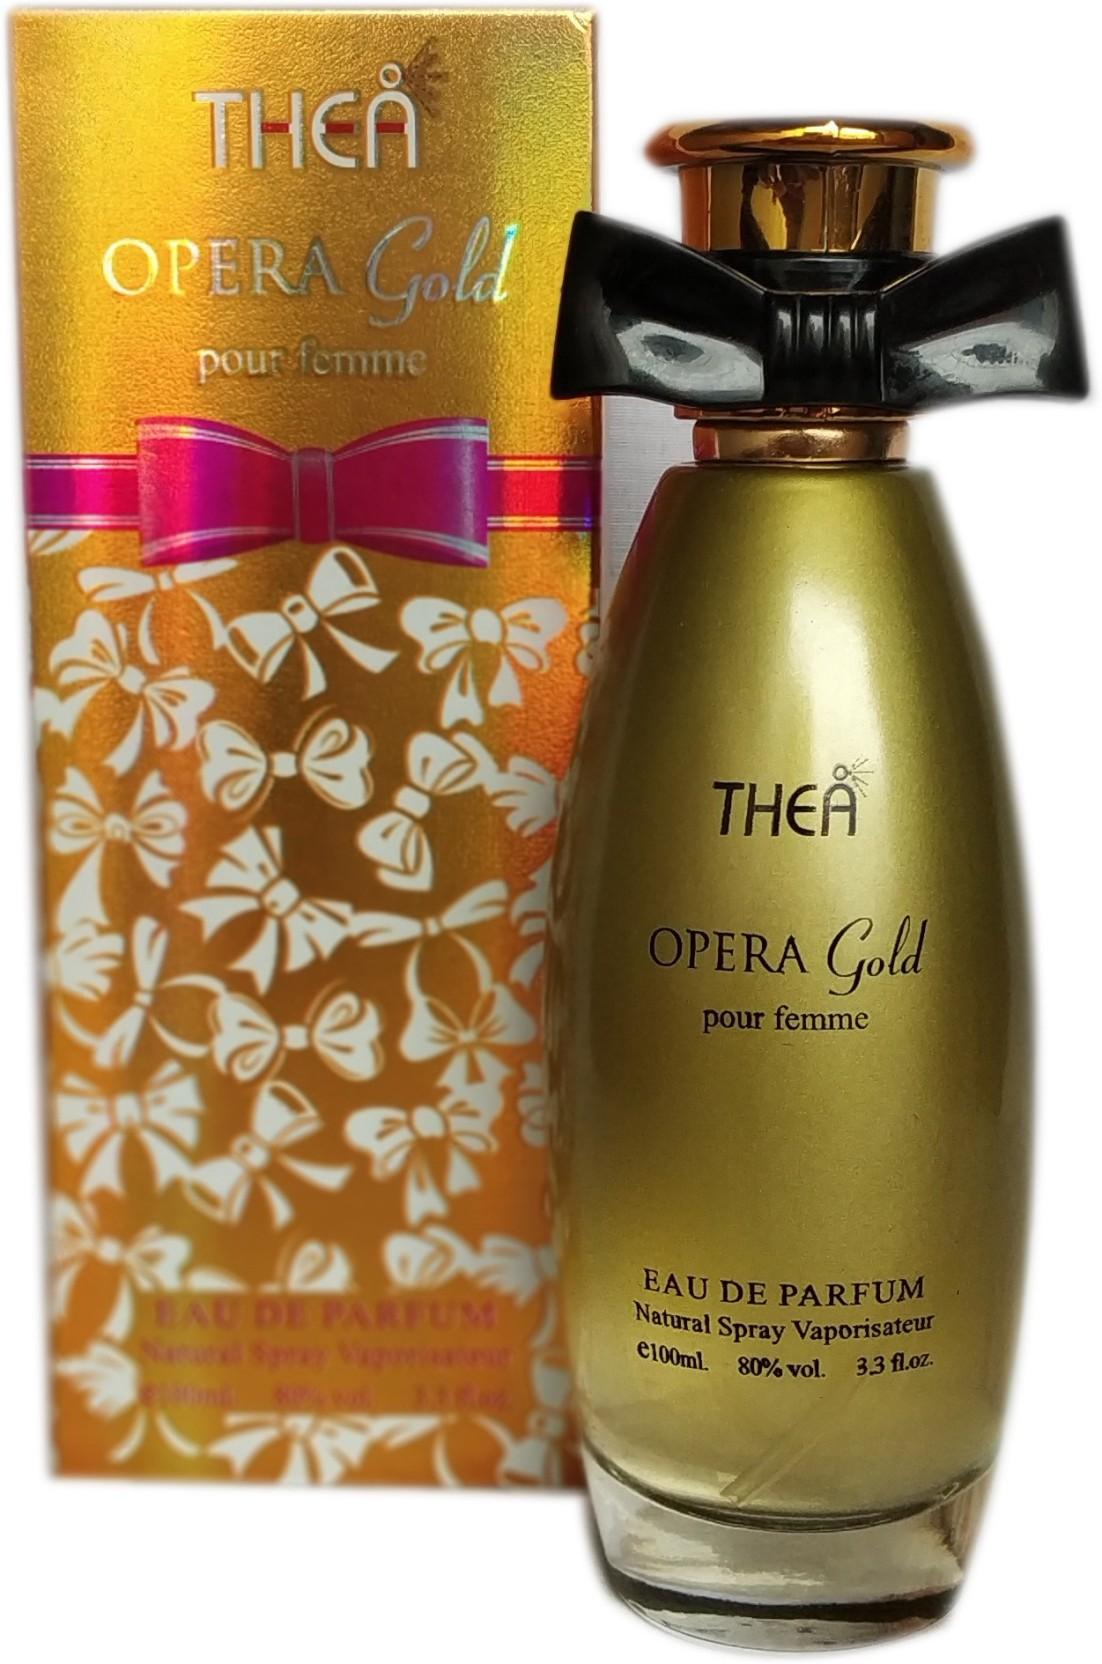 Thea Opera India Eau Parfum Ml In De 100 Online Buy Gold 0PkwOn